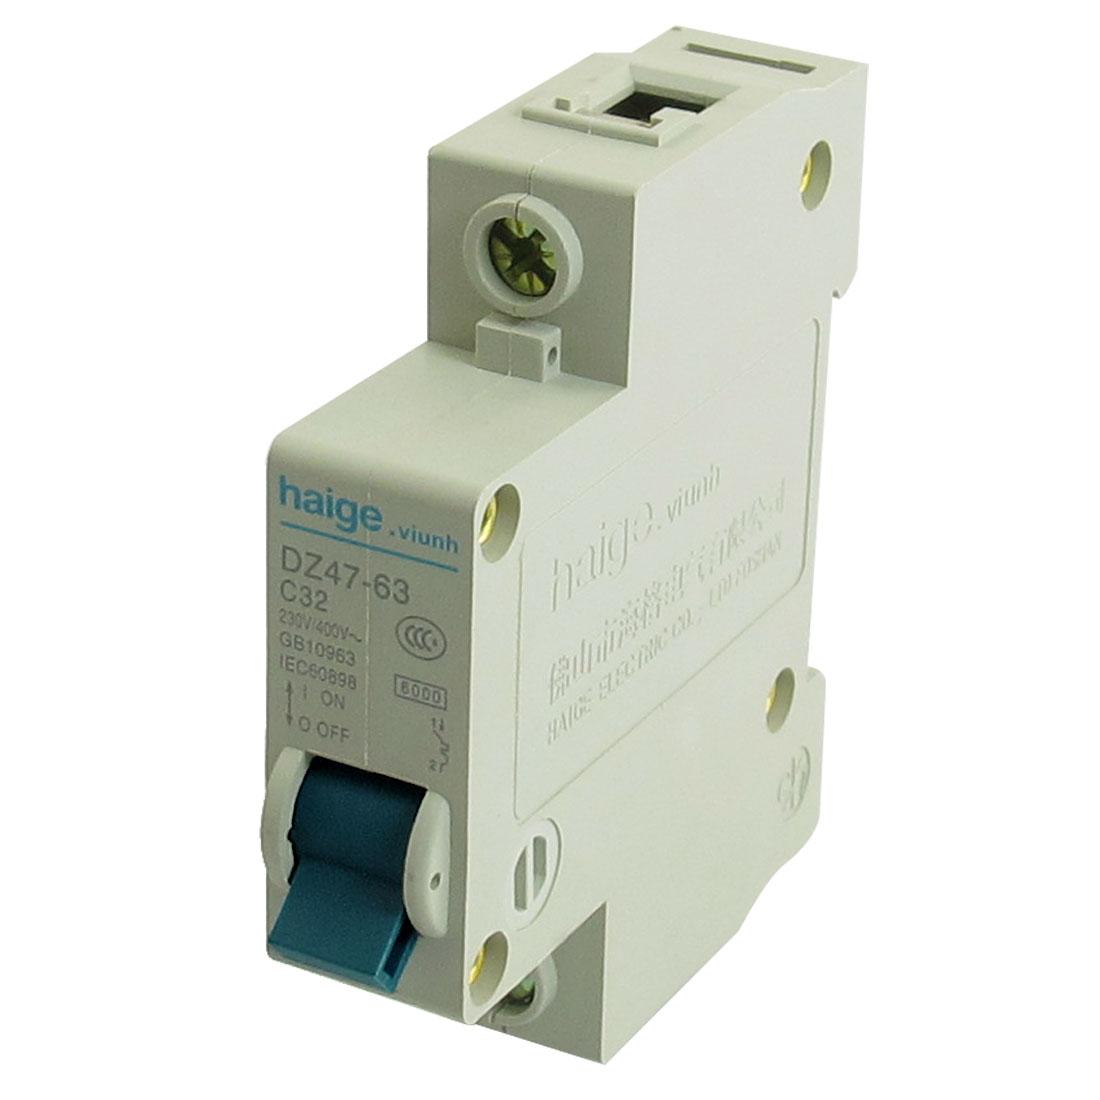 AC 230V 400V 32A 1 Pole MCB Miniature Circuit Breaker DZ47-63 C32